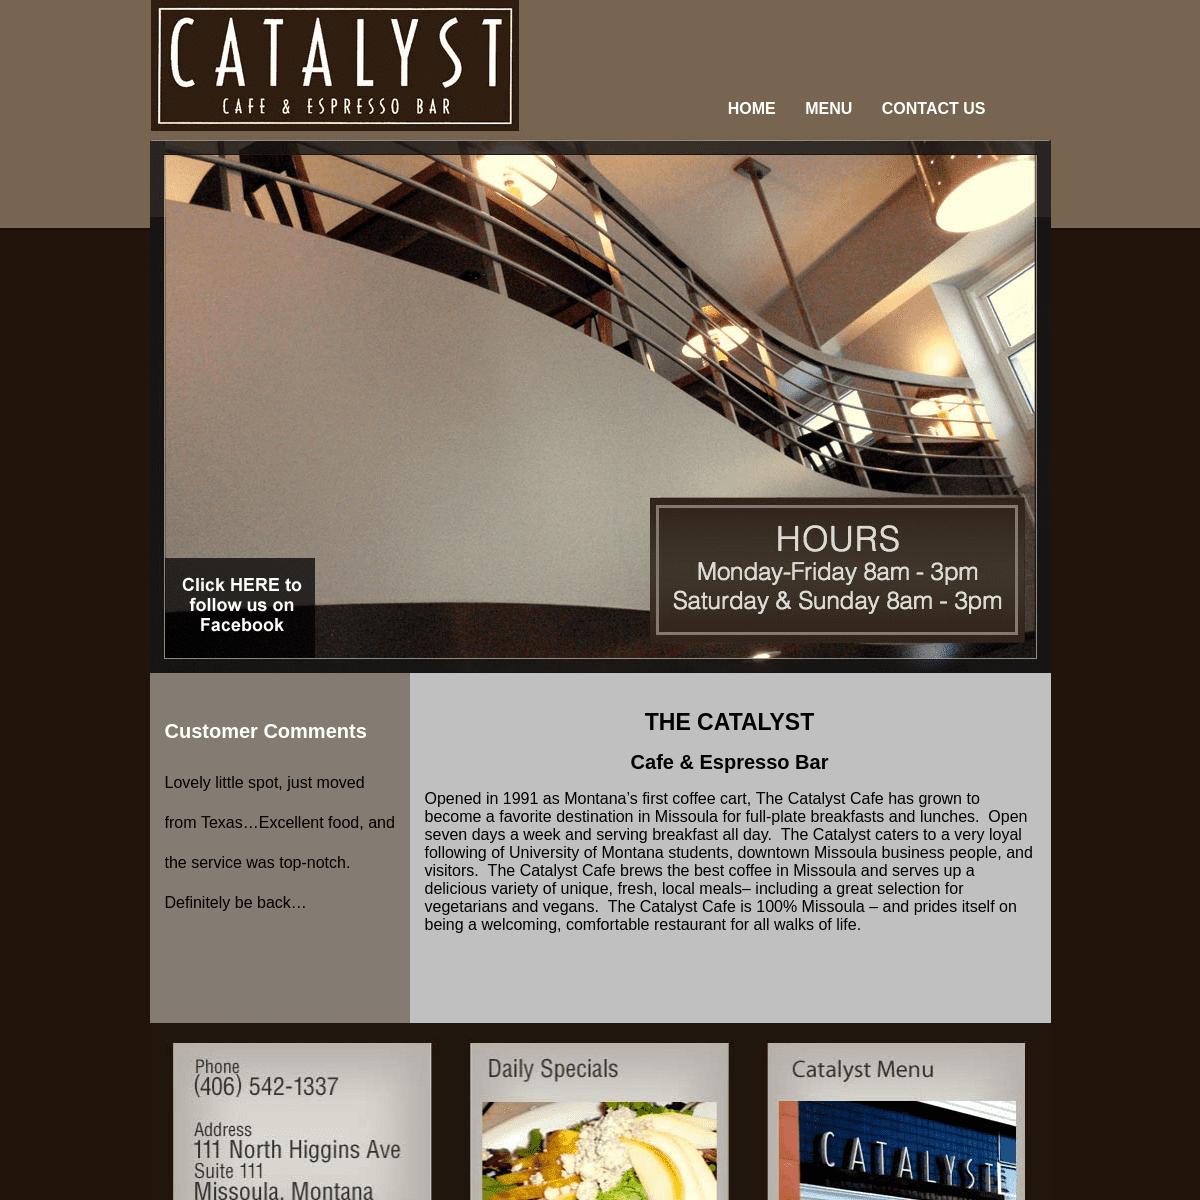 Missoula Cafe - Missoula Restaurant - Coffee Shop - Great Food - Downtown MissoulaCatalyst Cafe - Cafe & Espresso Bar